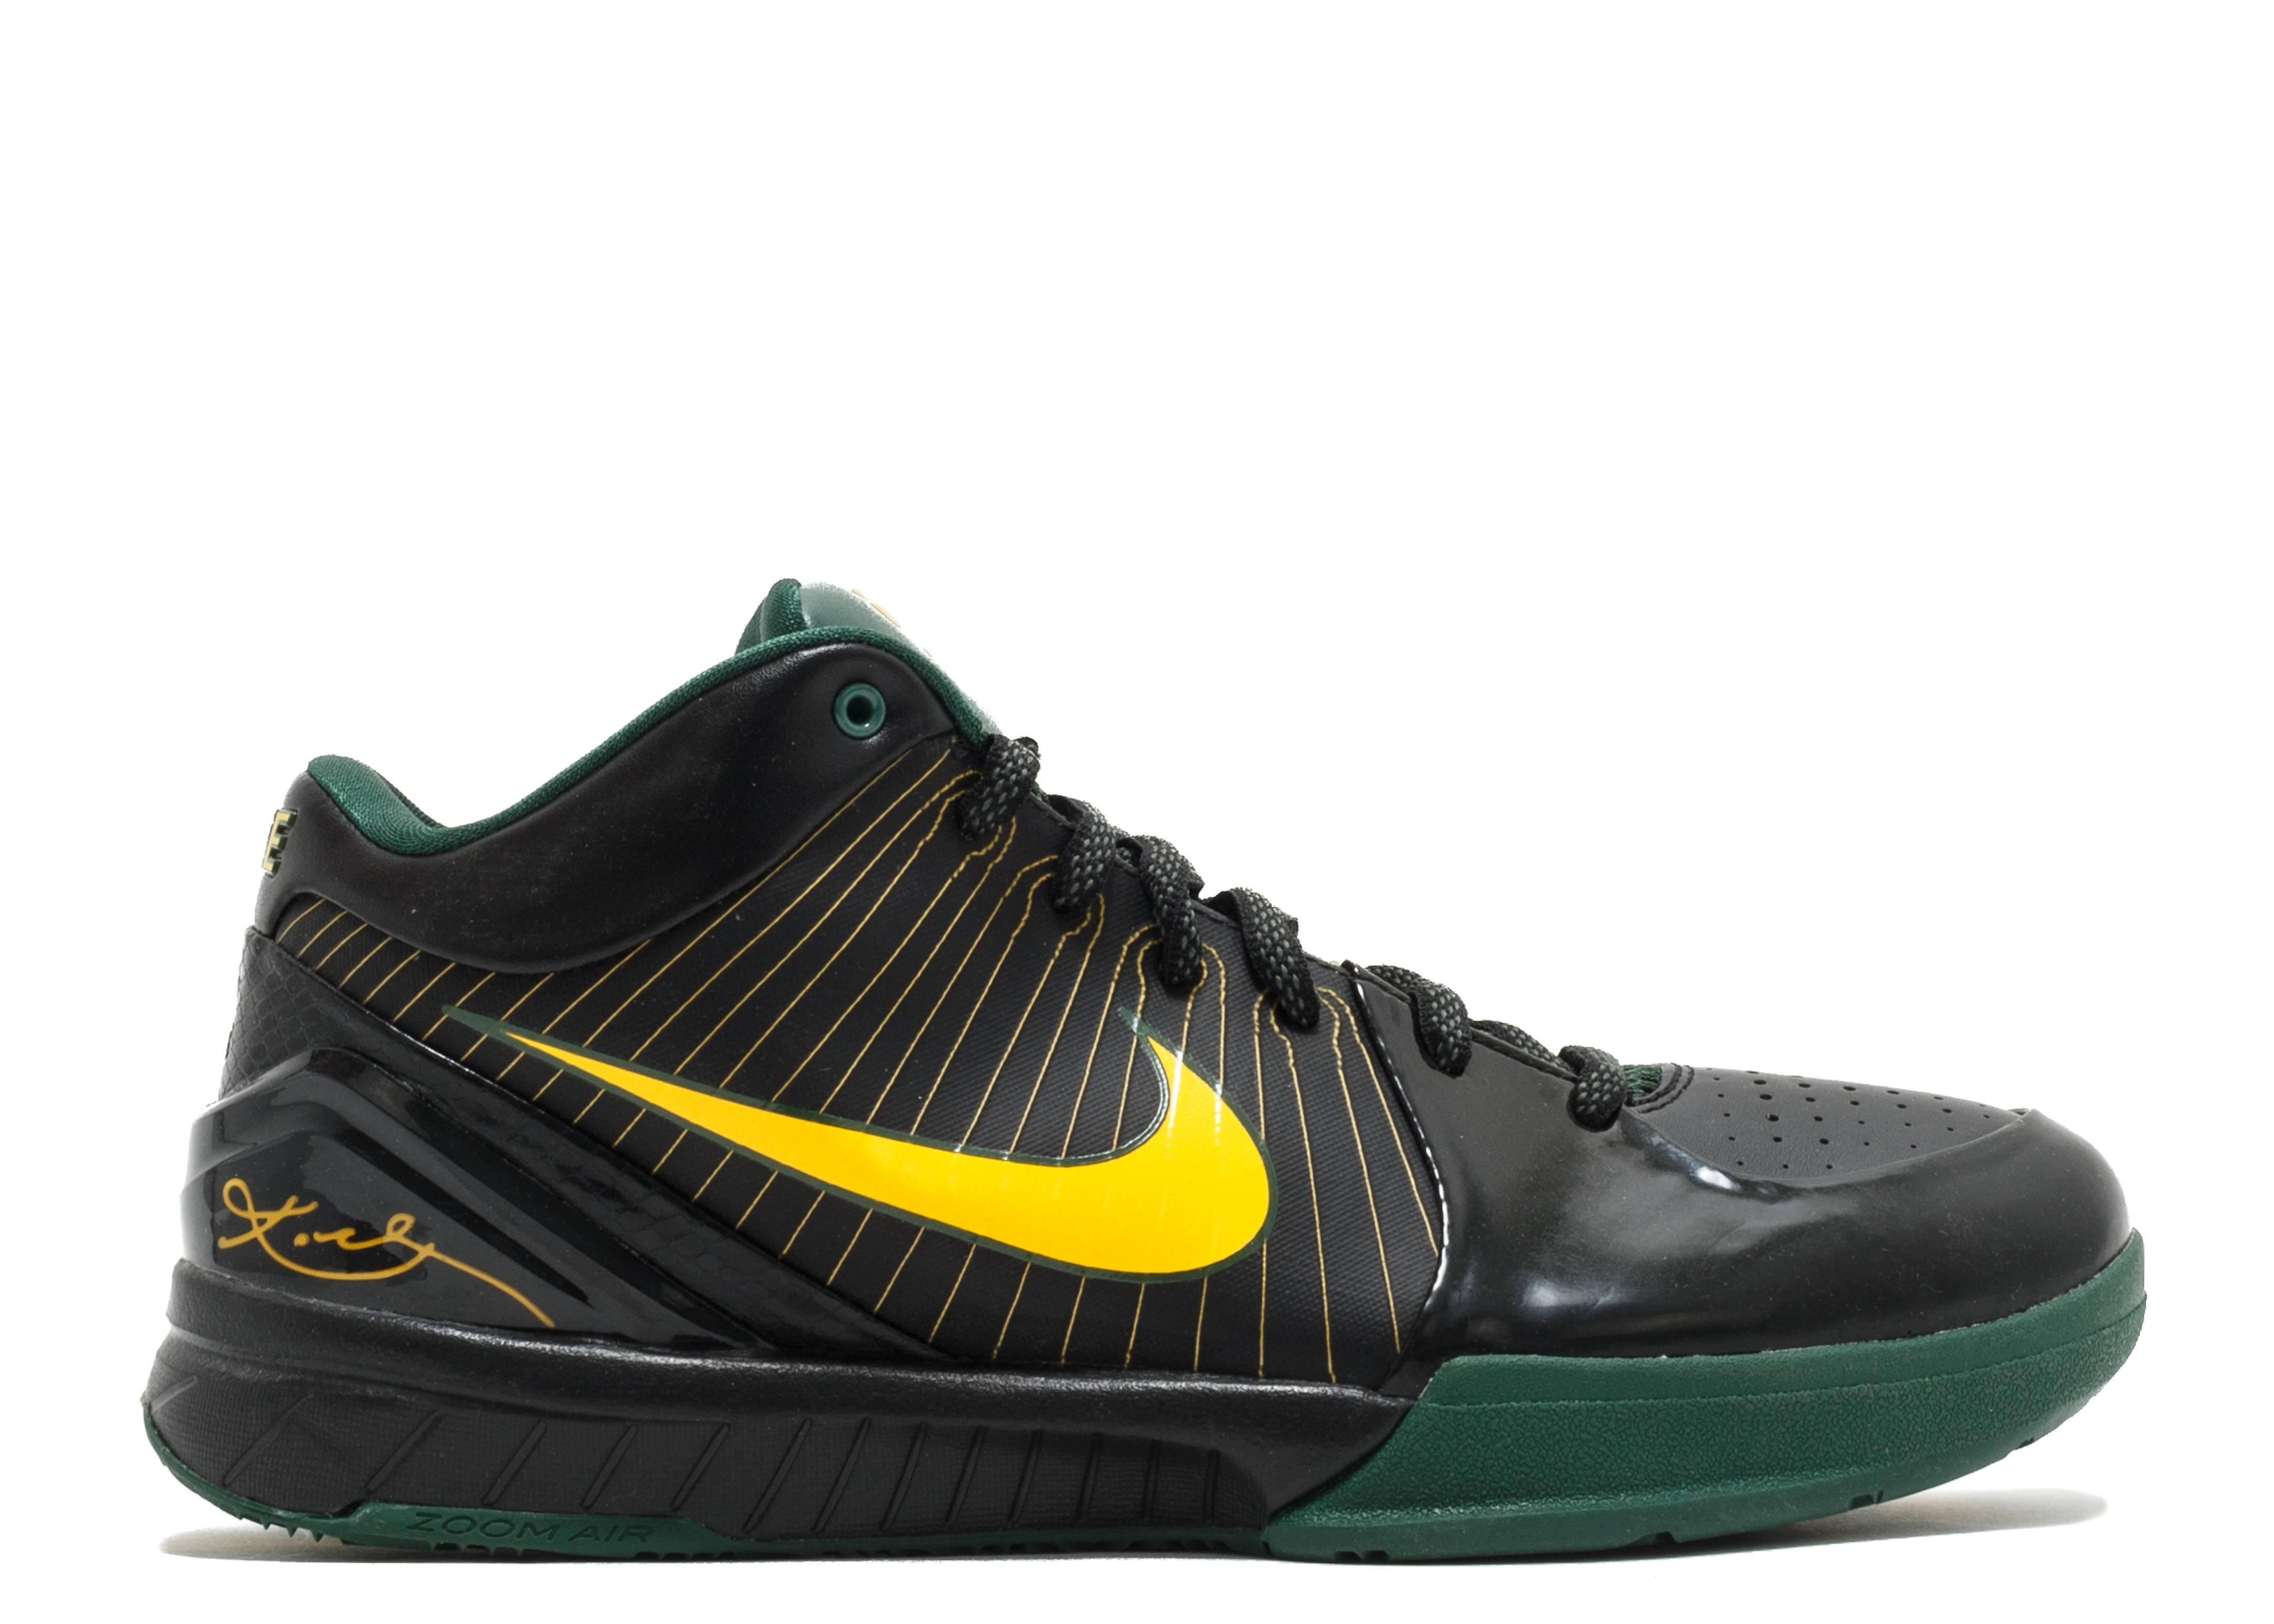 Zoom Kobe 4 Rice Nike 344335 071 Blackvrsty Mz Dp